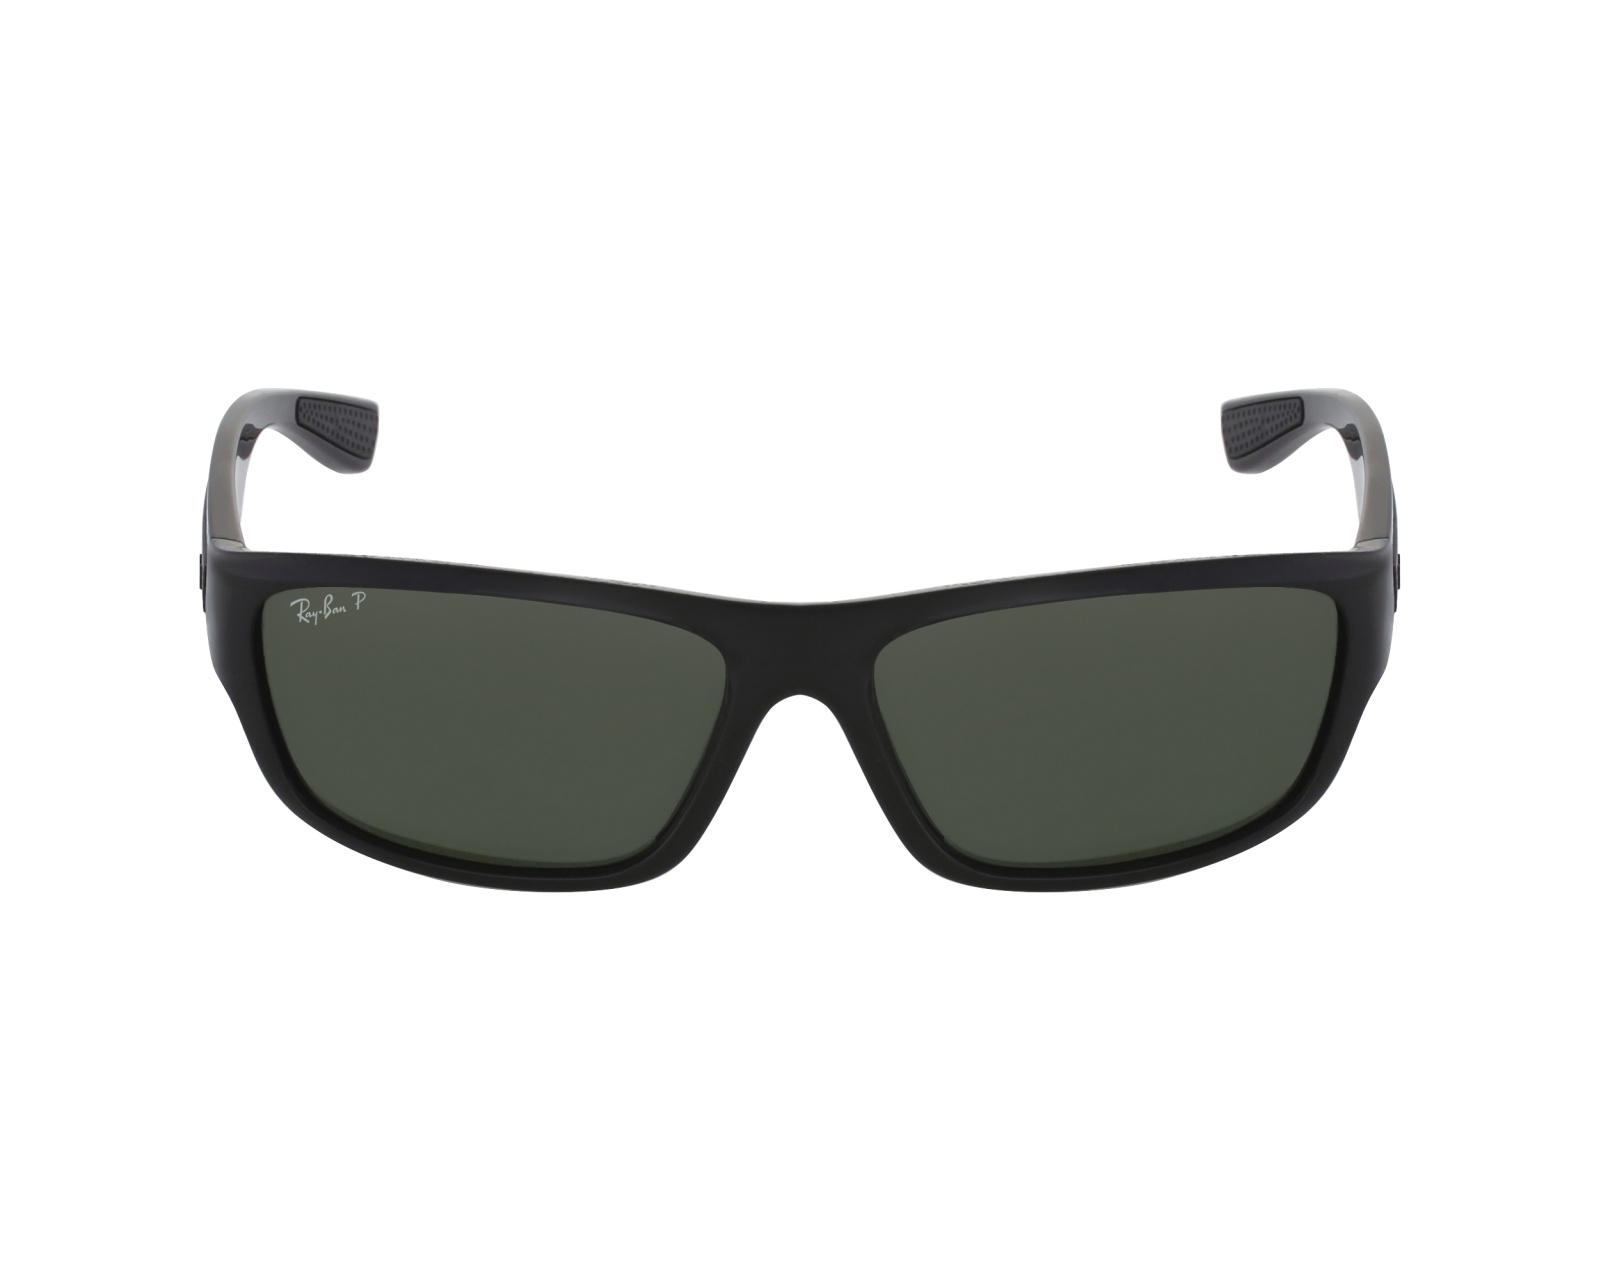 b1d9221b57 thumbnail Sunglasses Ray-Ban RB-4196 601 9A - Black profile view